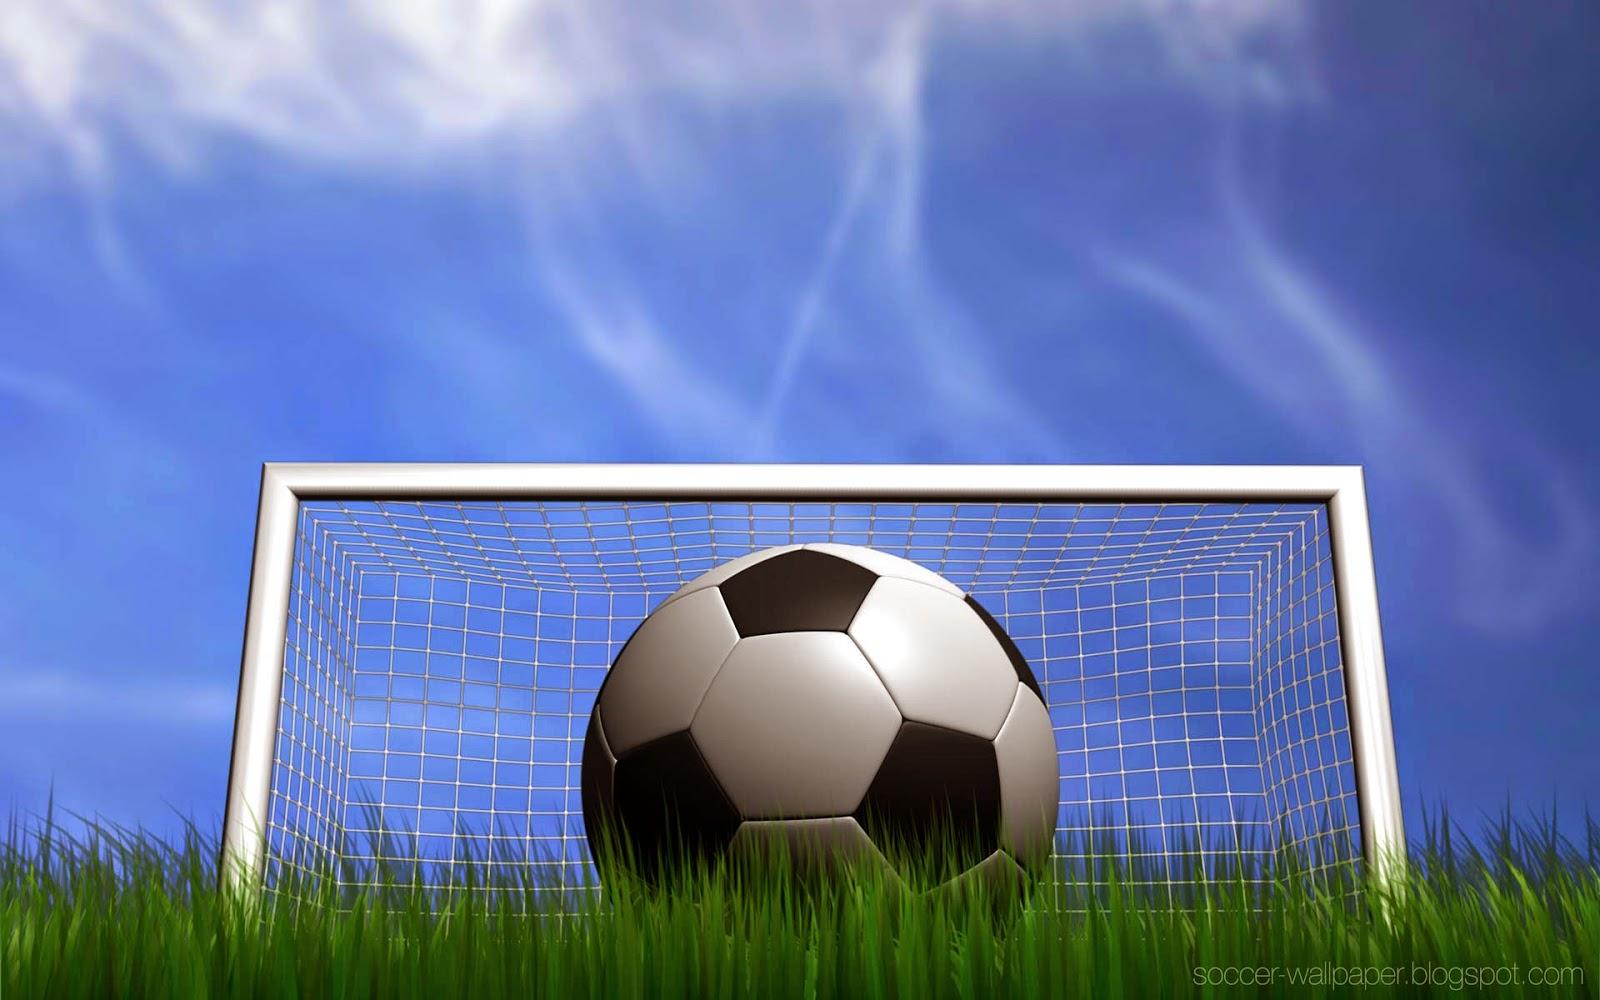 30 Soccer WallpaperTop 30 Soccer WallpaperMost 30 Soccer Wallpaper 1600x1000